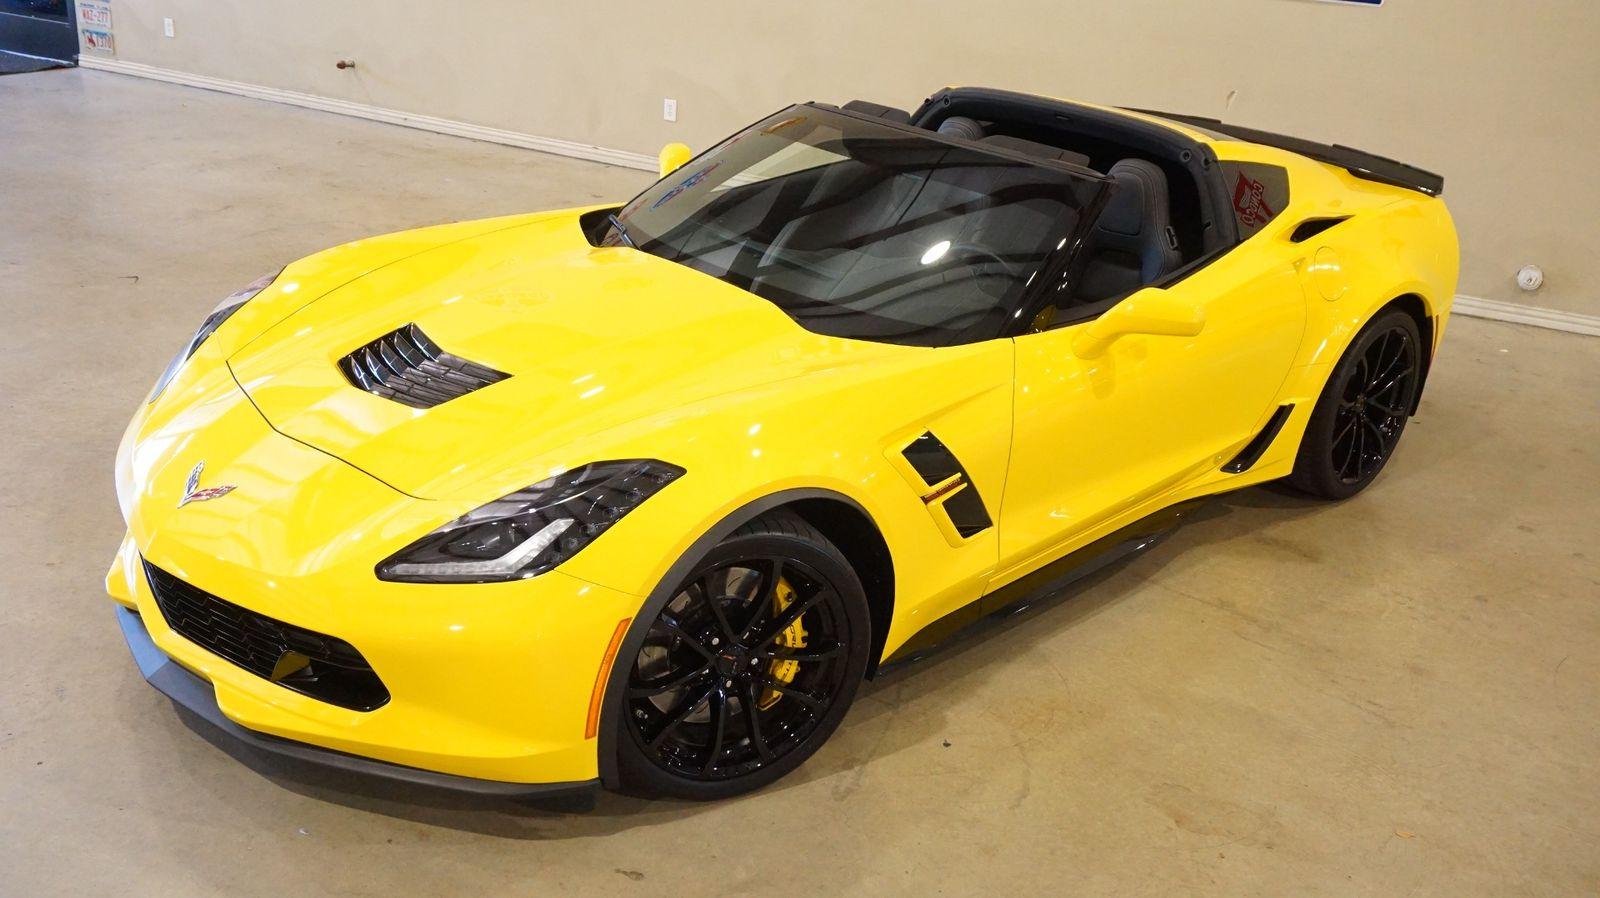 2017 Yellow Chevrolet Corvette Grand Sport 1LT | C7 Corvette Photo 7